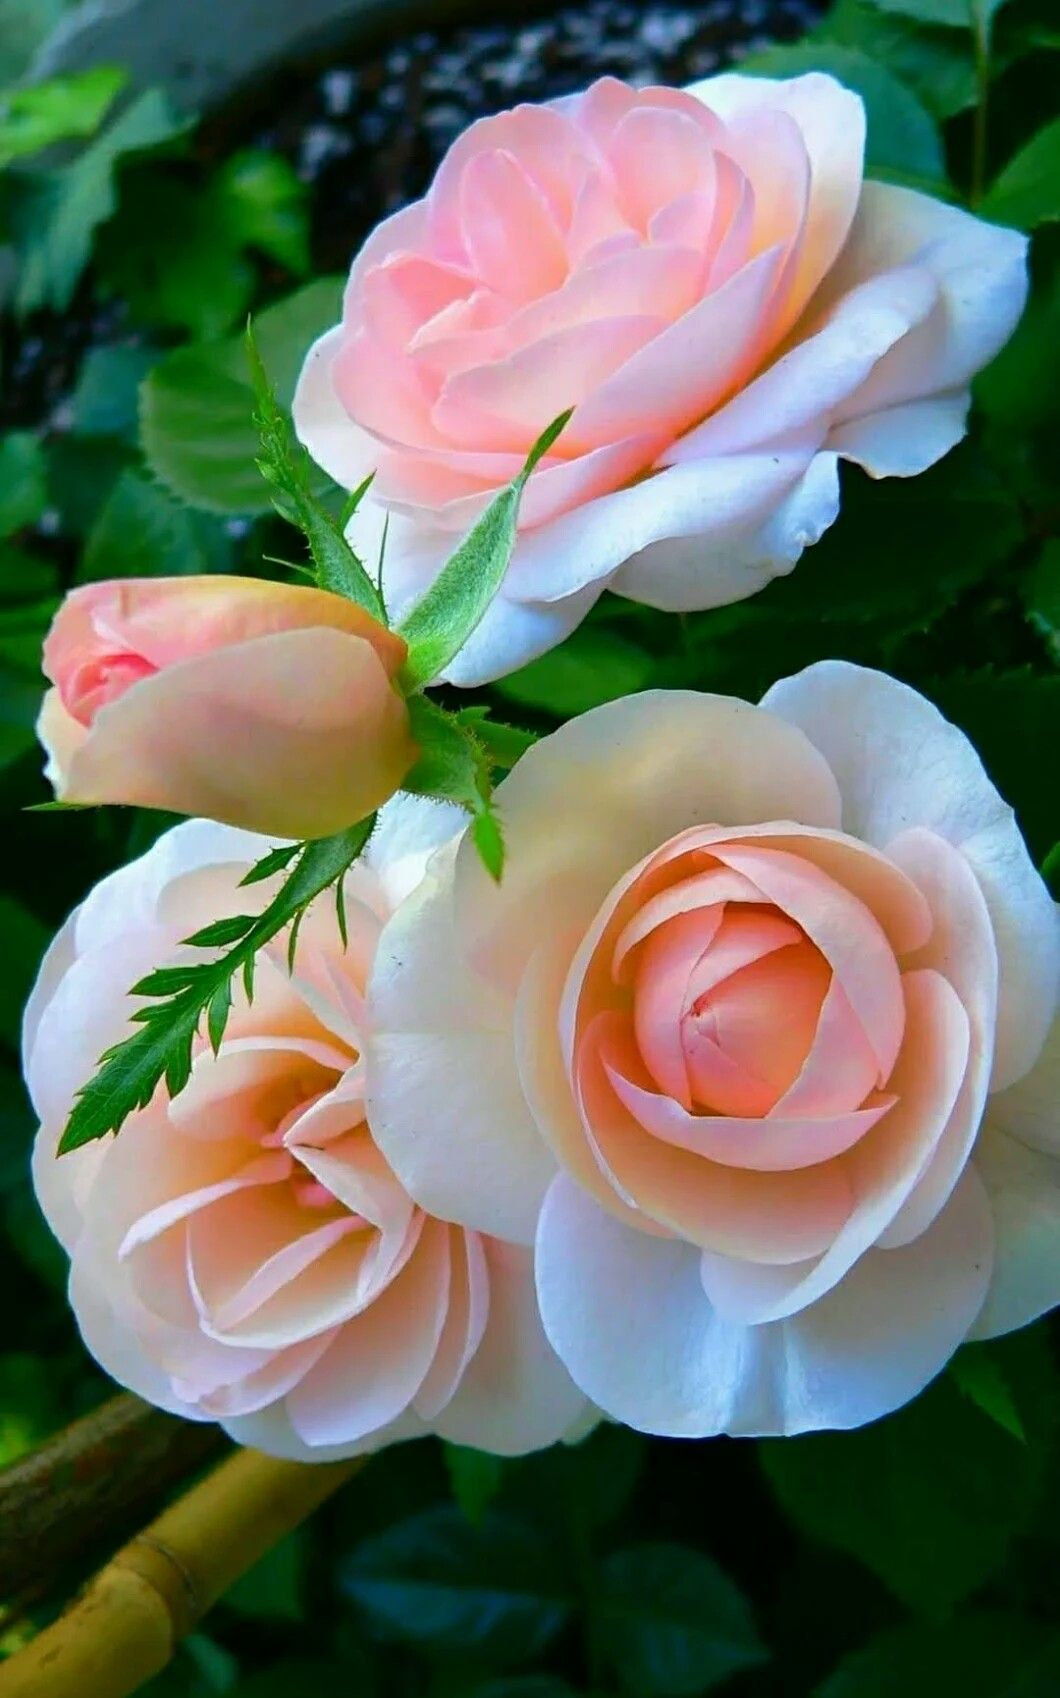 Belssimas rosas rosas in 2018 pinterest beautiful flowers belssimas rosas colorful flowers love flowers wonderful flowers blooming flowers unusual flowers izmirmasajfo